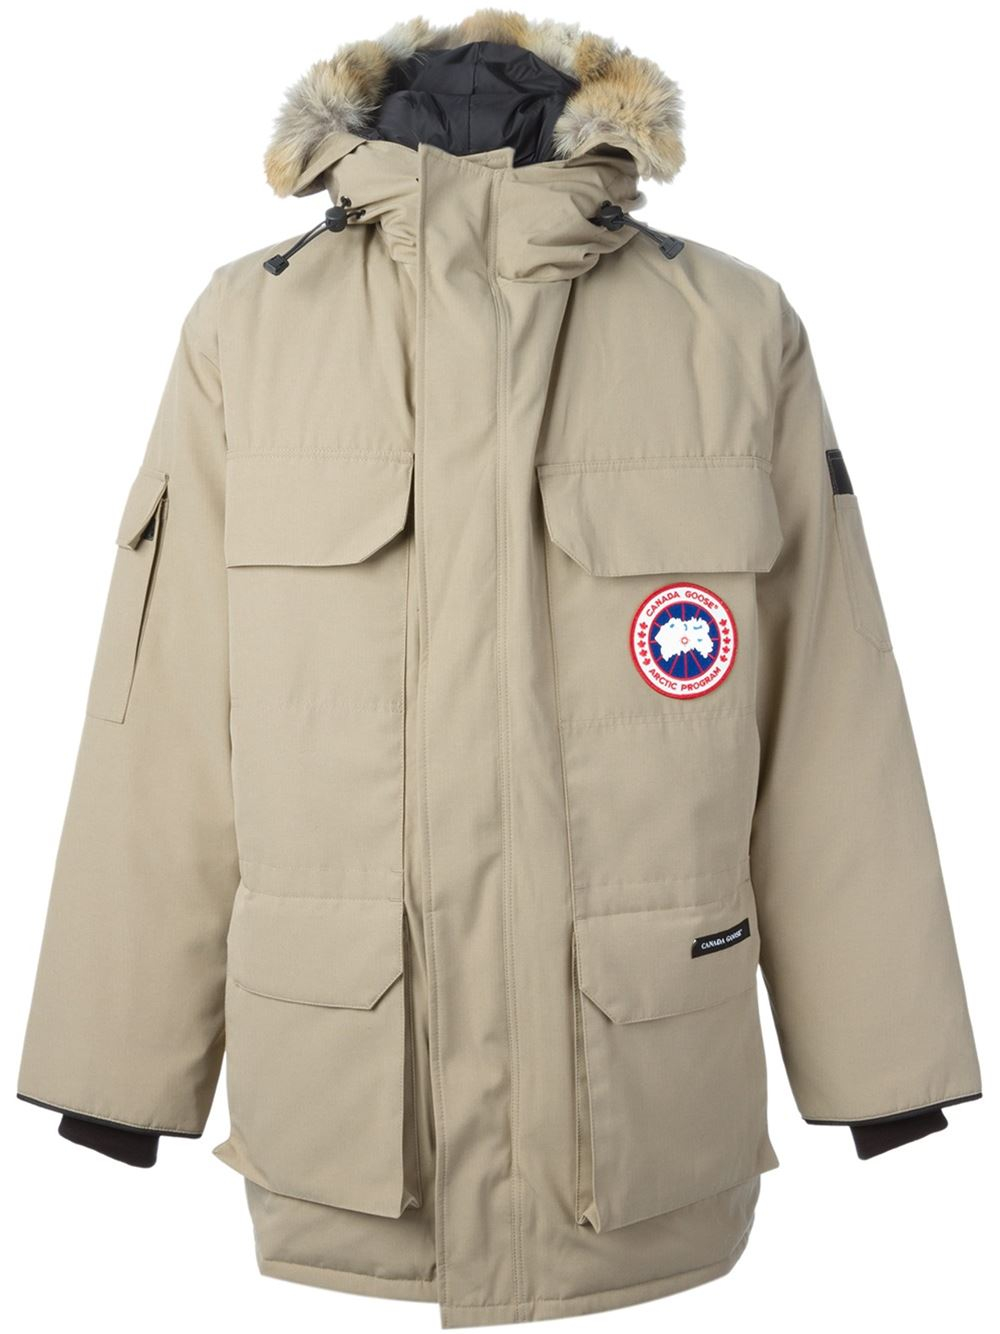 Canada Goose jackets: the status symbol, explained - Vox